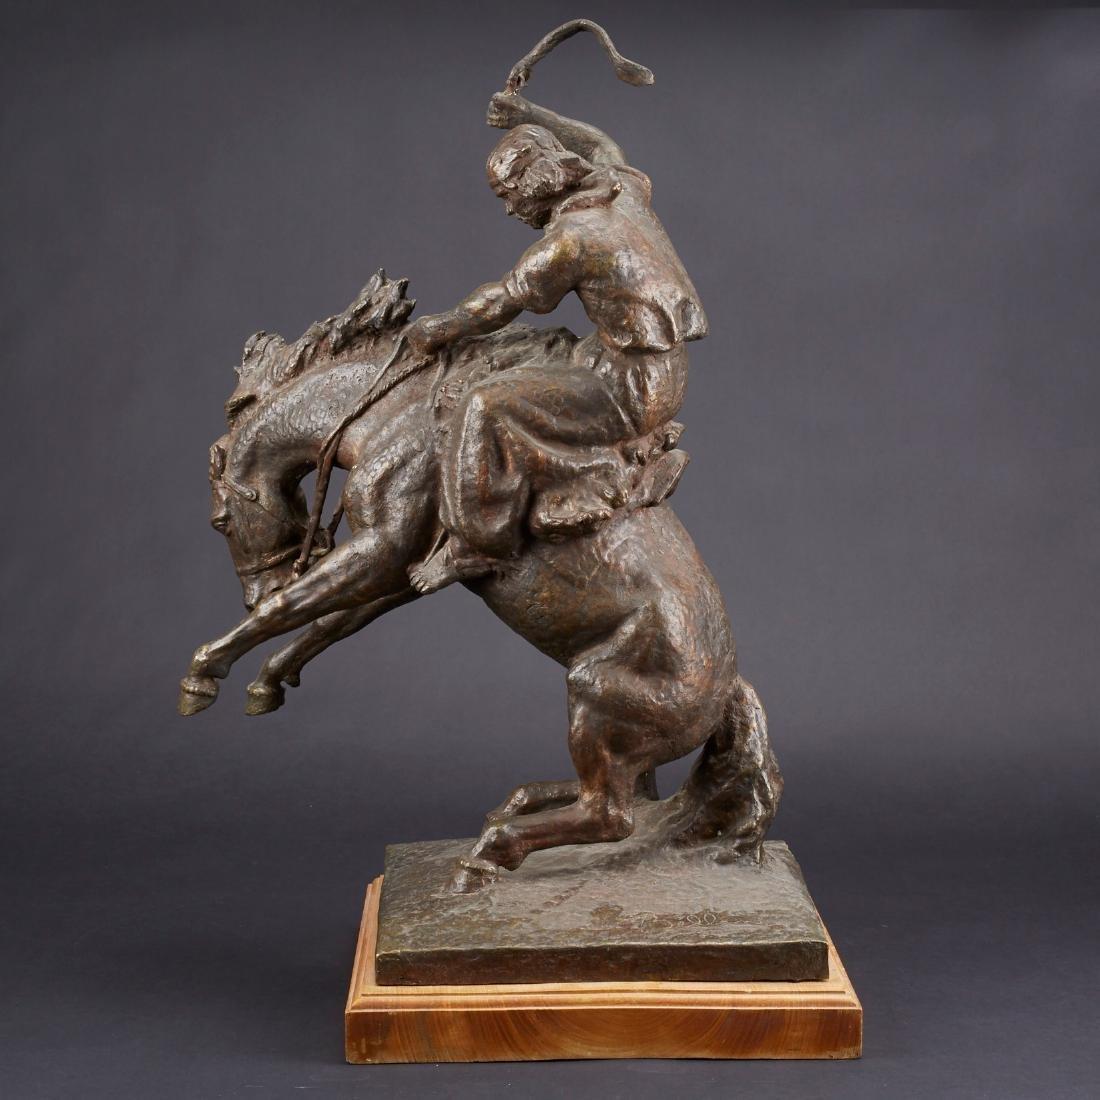 Jose Belloni Jineteando Bronze Sculpture - 4